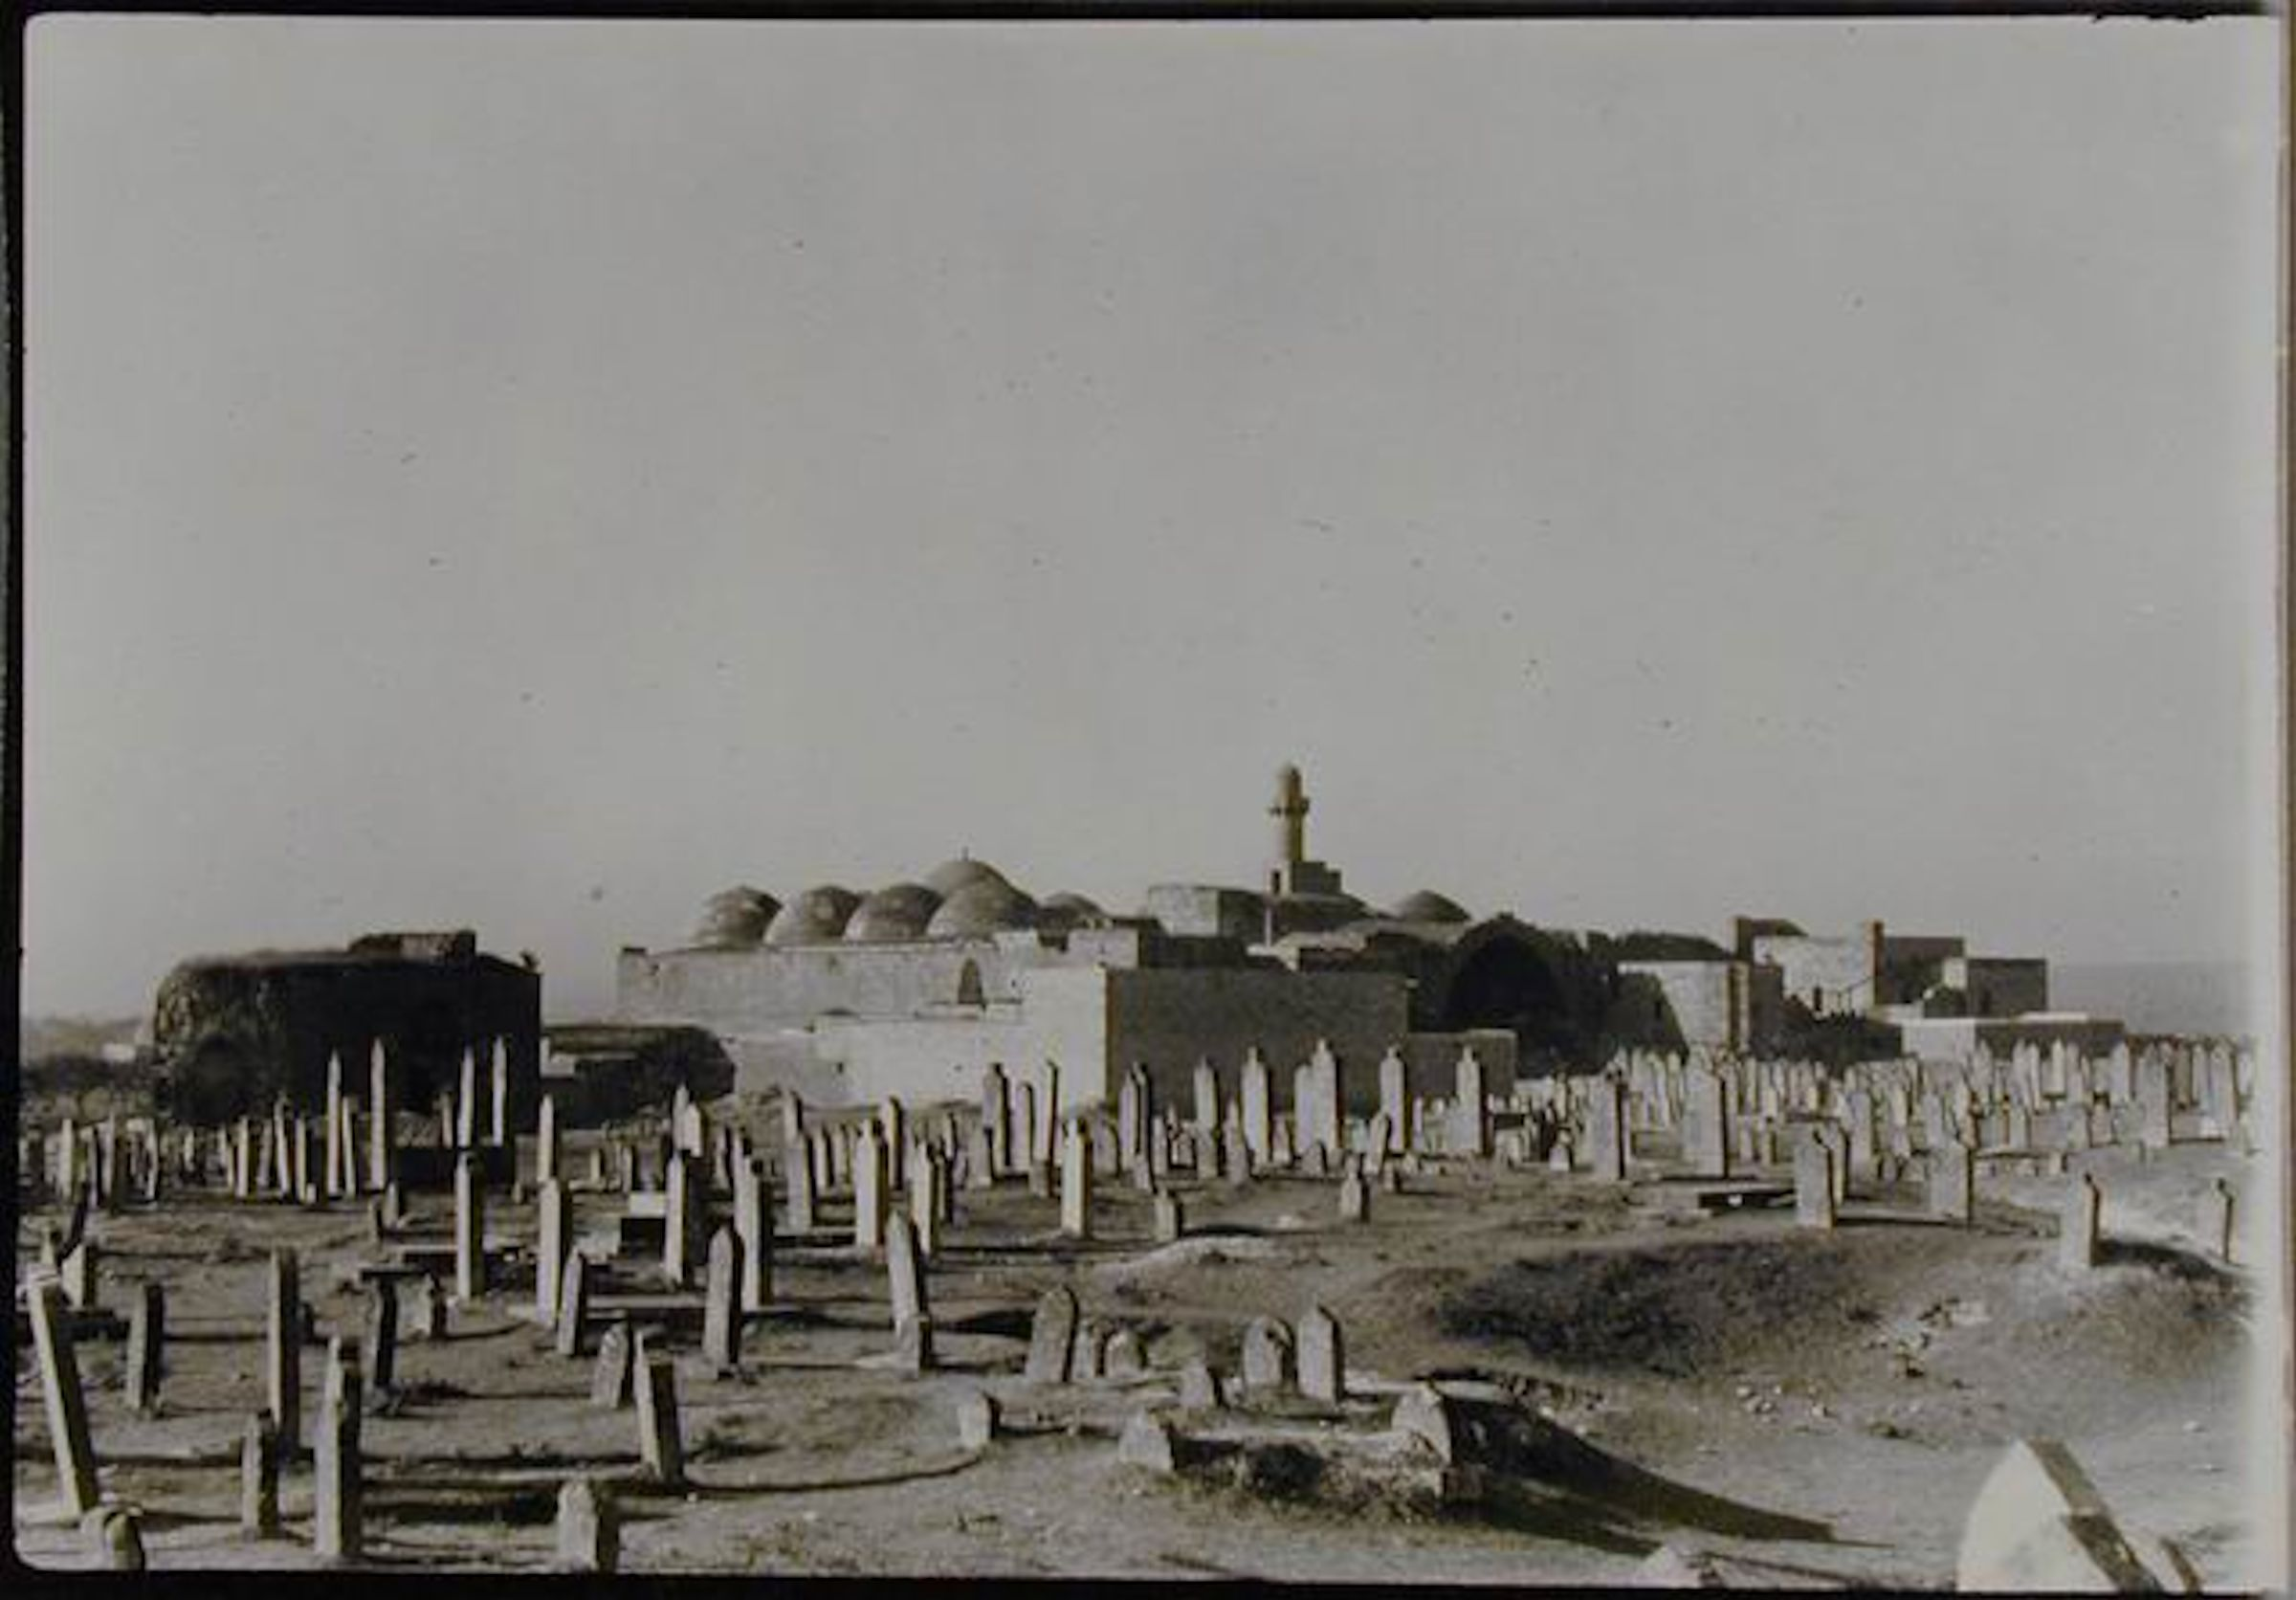 Deborah feller artist deborahfeller view of madrasa al firdaws from nearby cemetery photo creswell archive ashmolean fandeluxe Choice Image